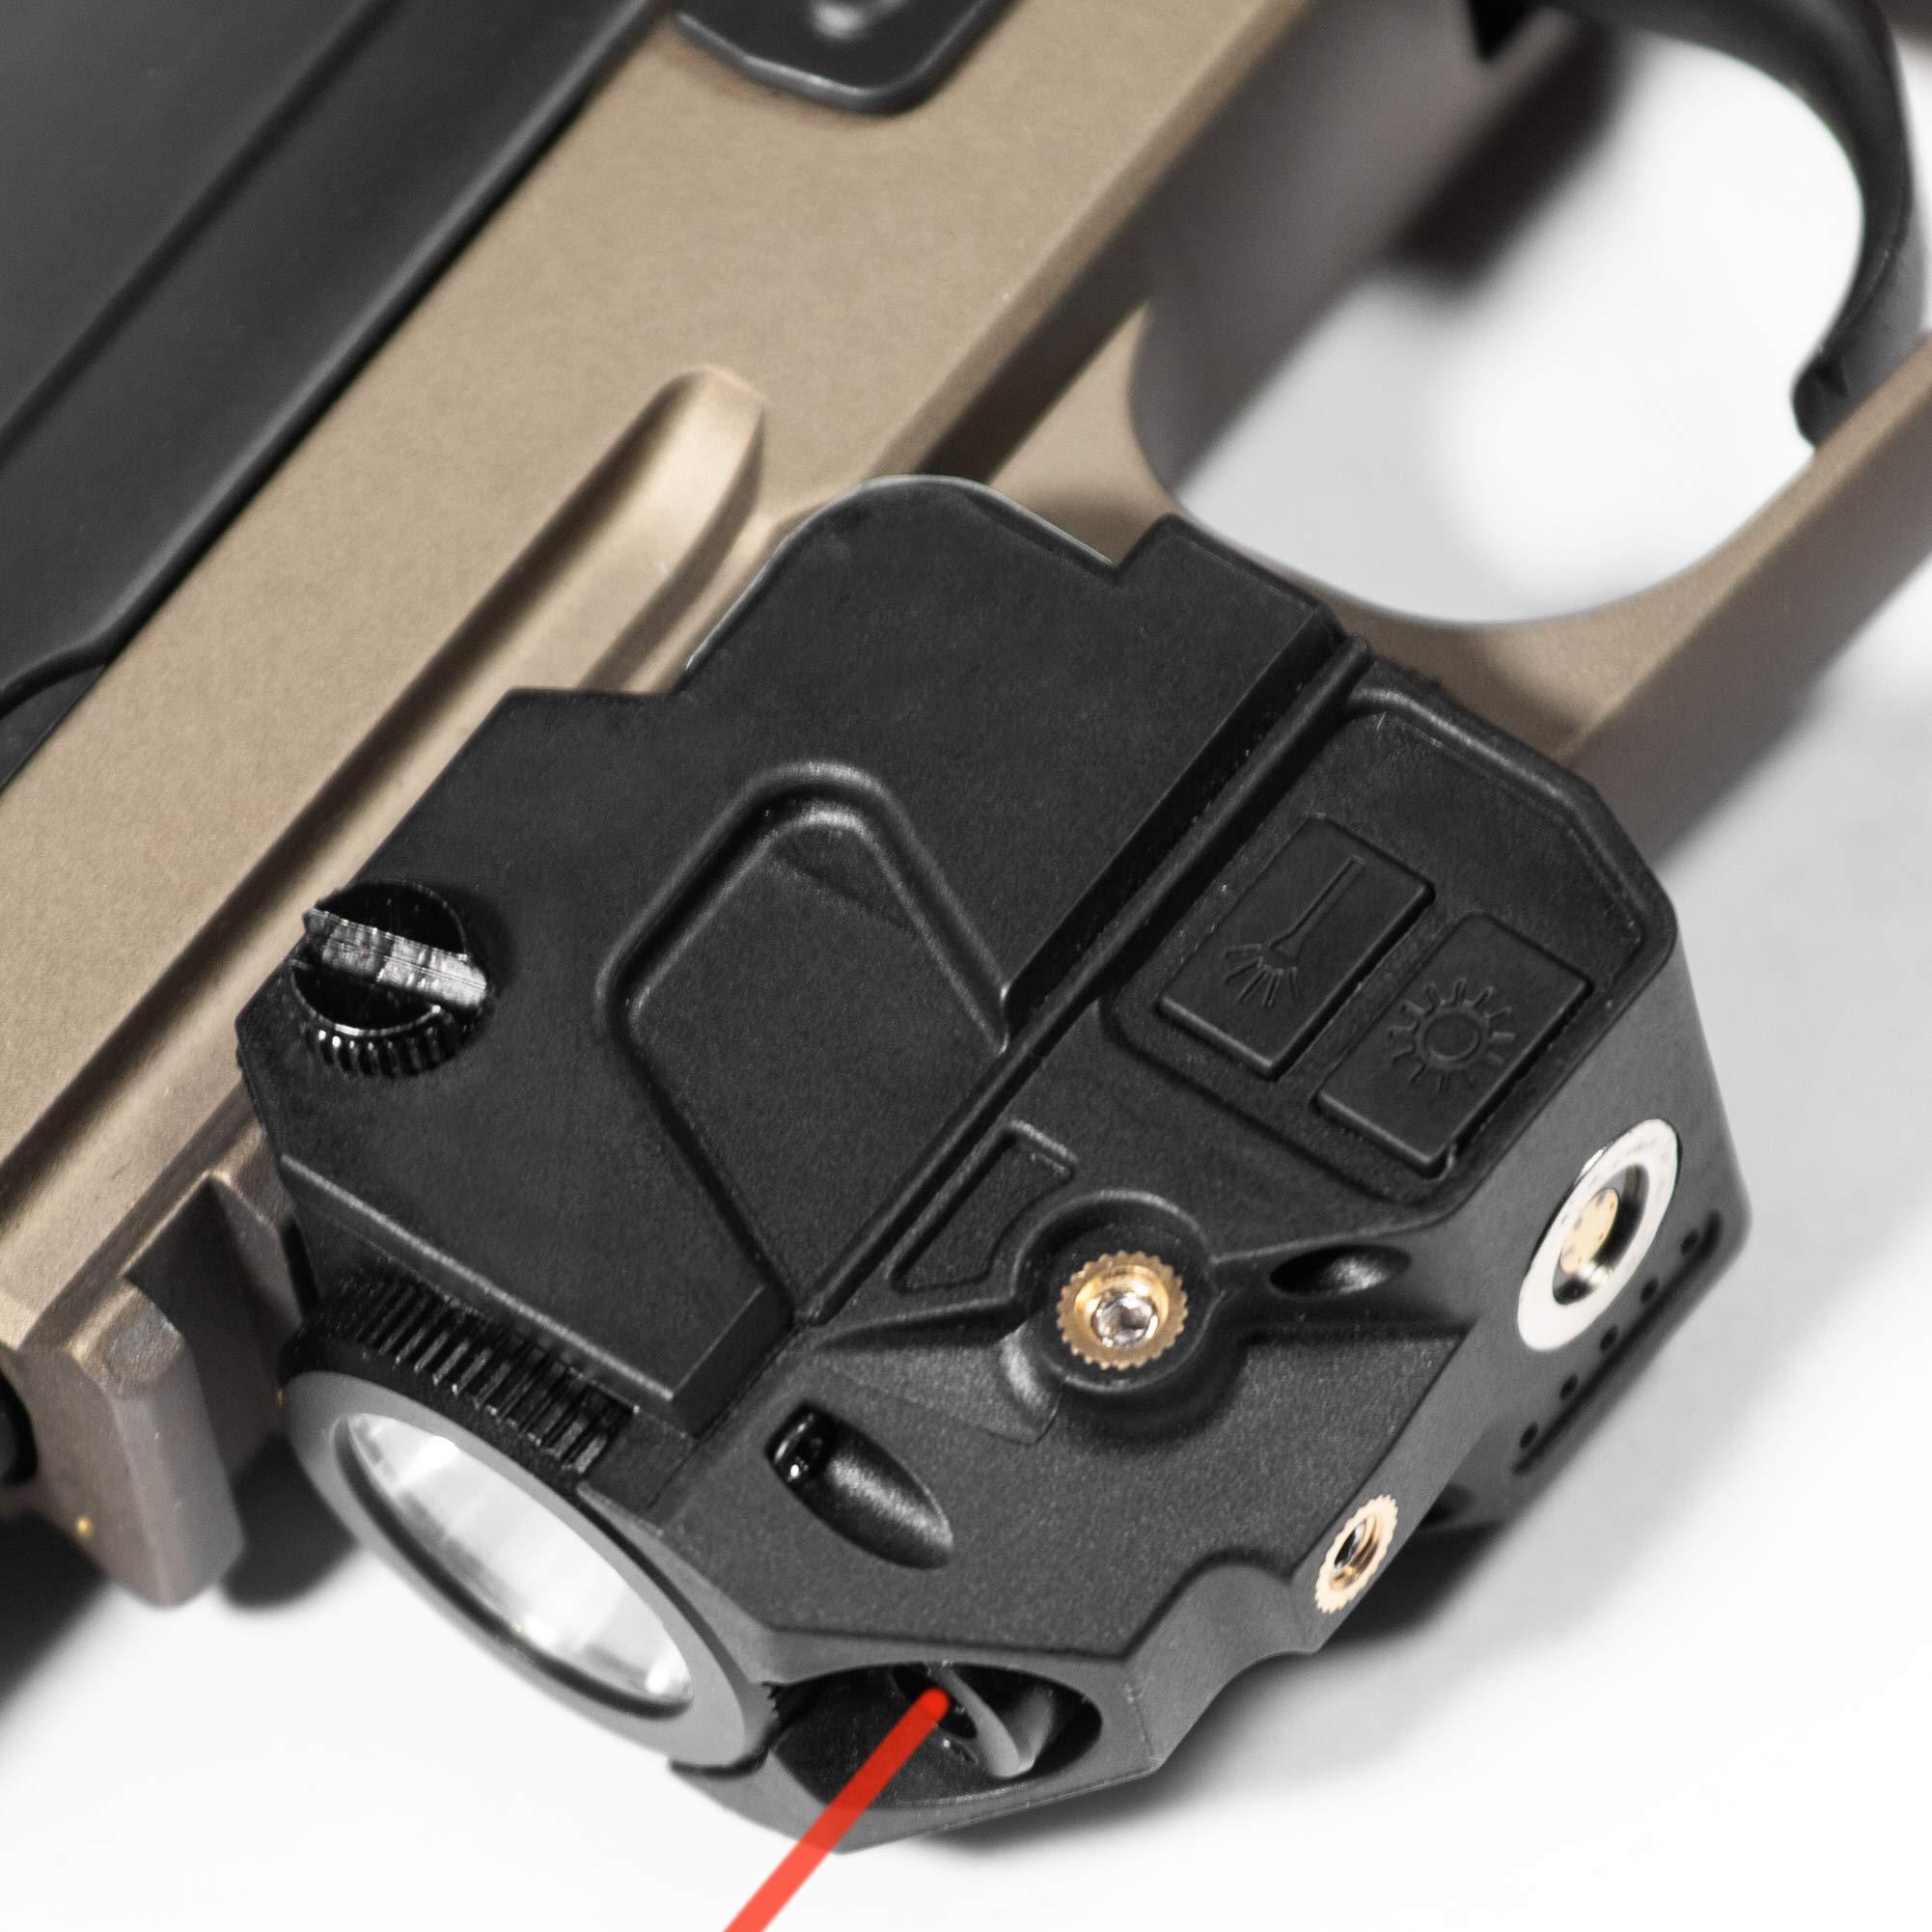 Firefly V2 Flashlight Laser Sight | Strobe Function | Combat Veteran Owned Company | Pistols | Rifles | 220 Lumens | Magnetic Charging | Laser Flashlight Combo For Handgun | Gun Light (Red-Laser) by Tacticon